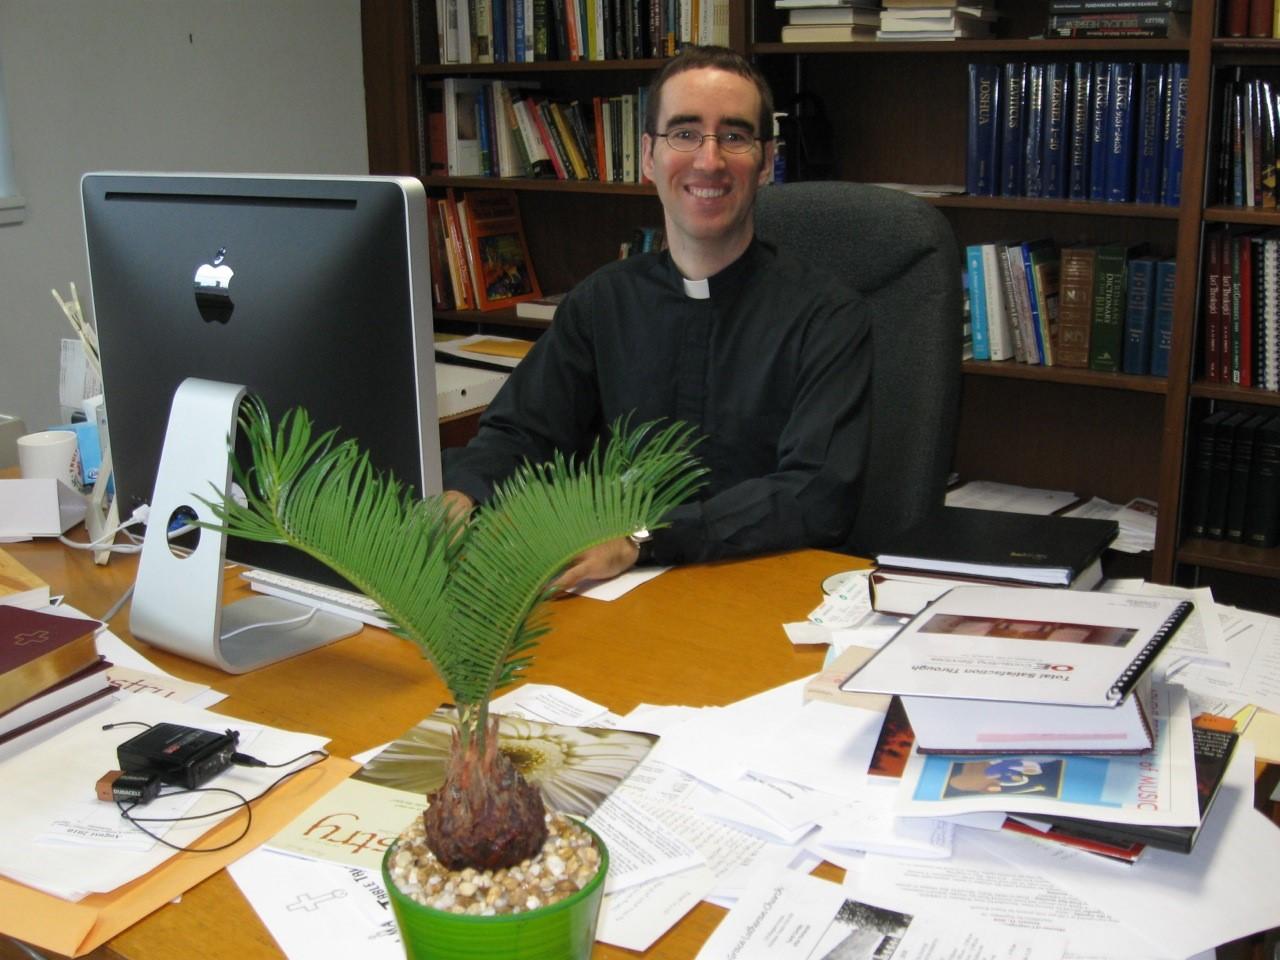 Pastor in Study